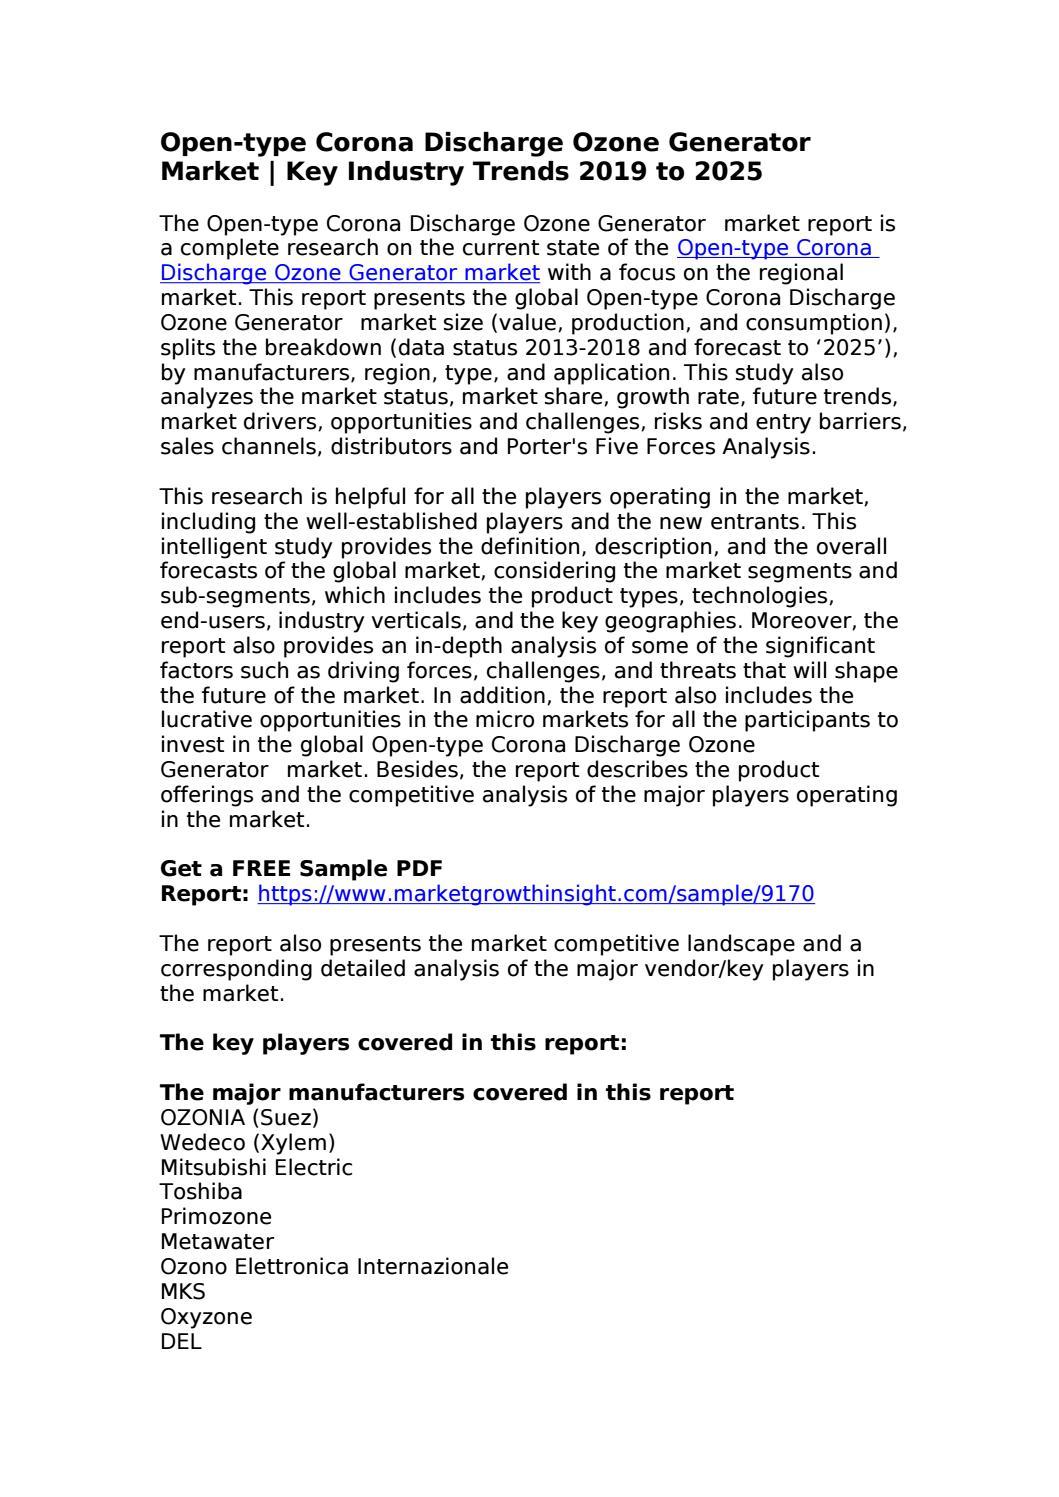 Open-type Corona Discharge Ozone Generator Market by sam